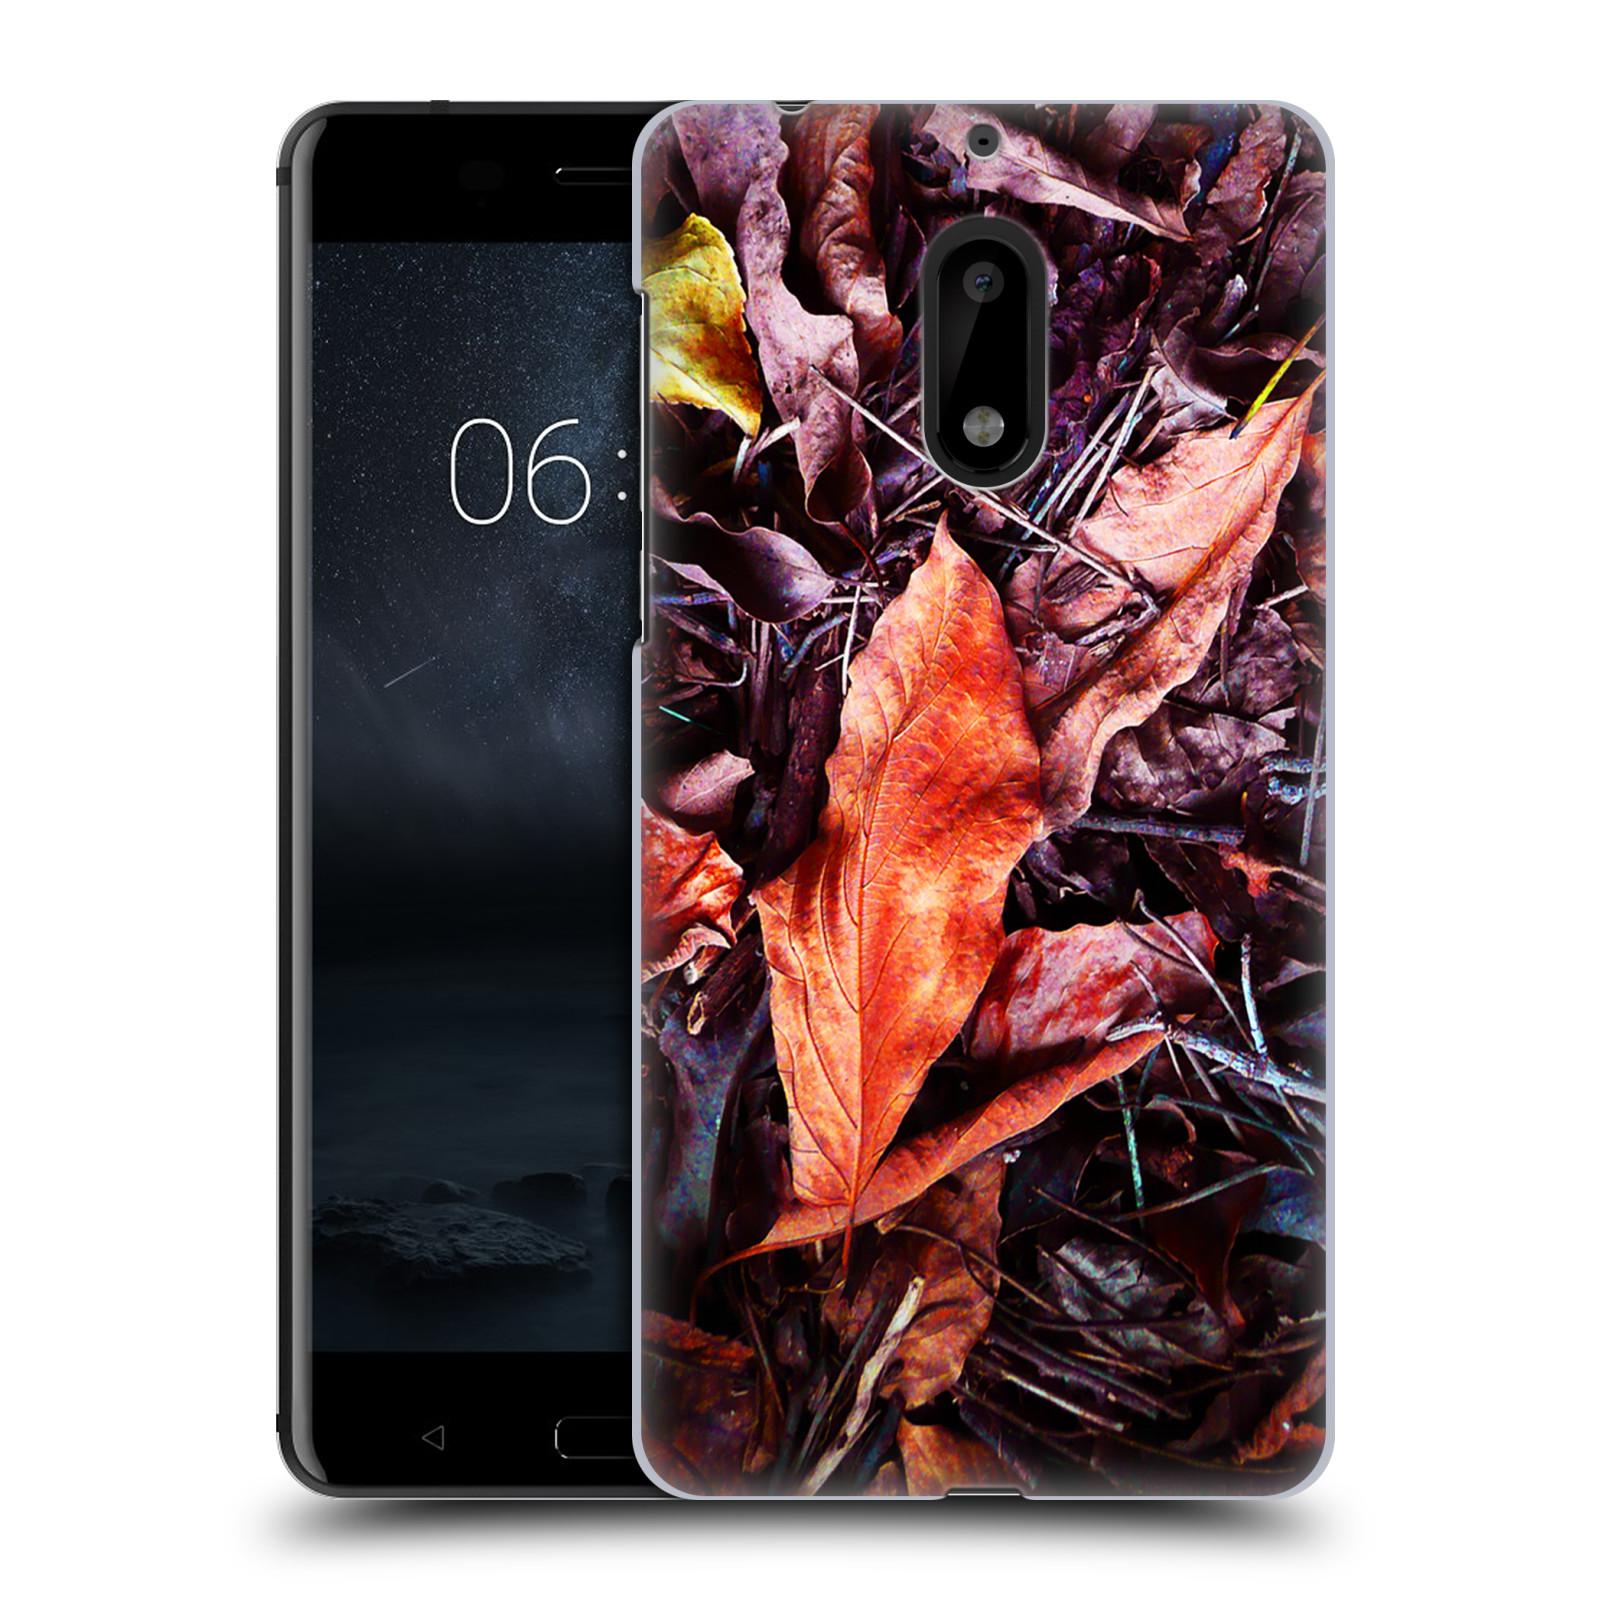 OFFICIAL-PETER-BARREDA-NATURE-HARD-BACK-CASE-FOR-NOKIA-PHONES-1